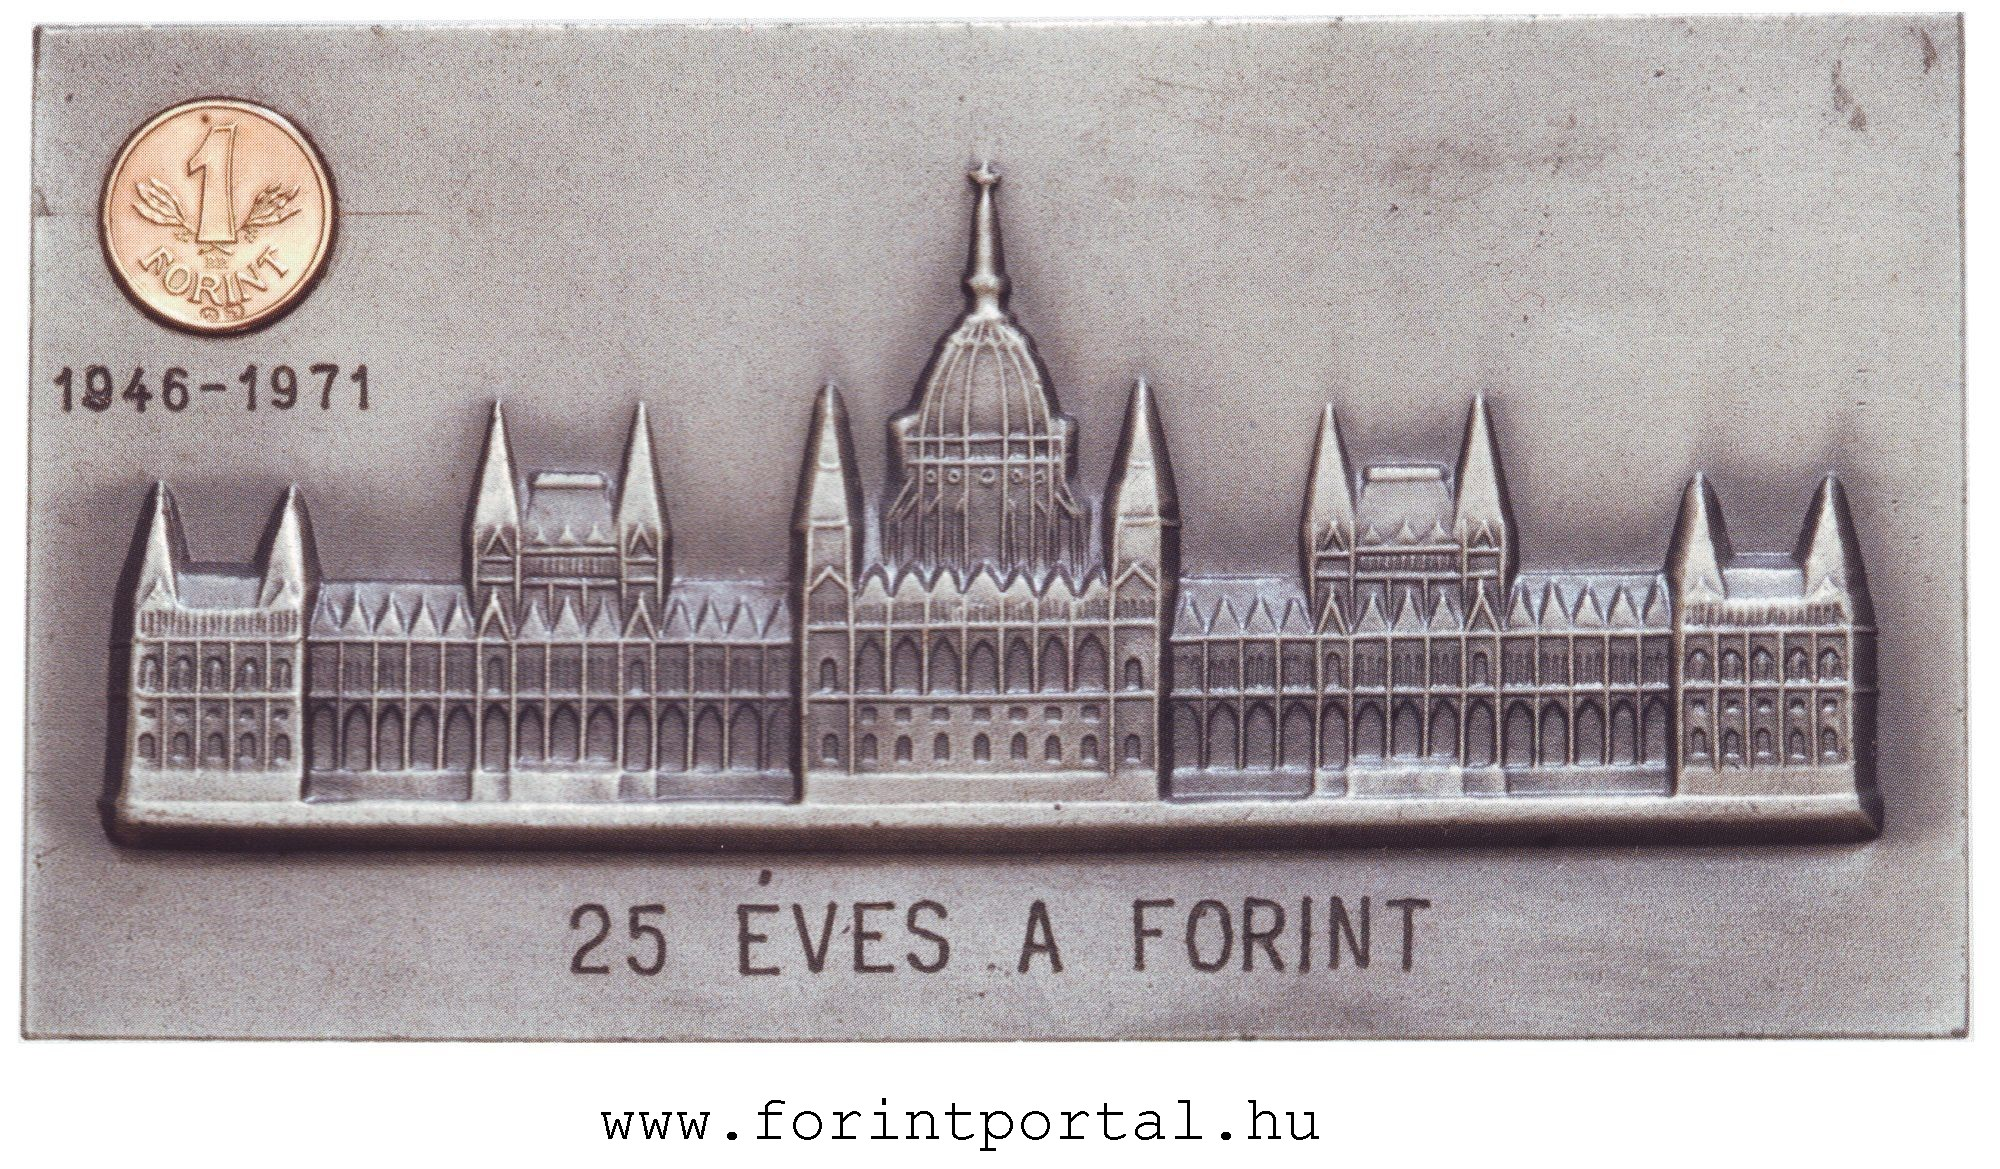 http://www.forintportal.hu/hirek/mini_1-forintos_ermek/mini_1-forintos_ermek_25_eves_a_forint_plakett_disztokban_mini_aranyermevel3.jpg